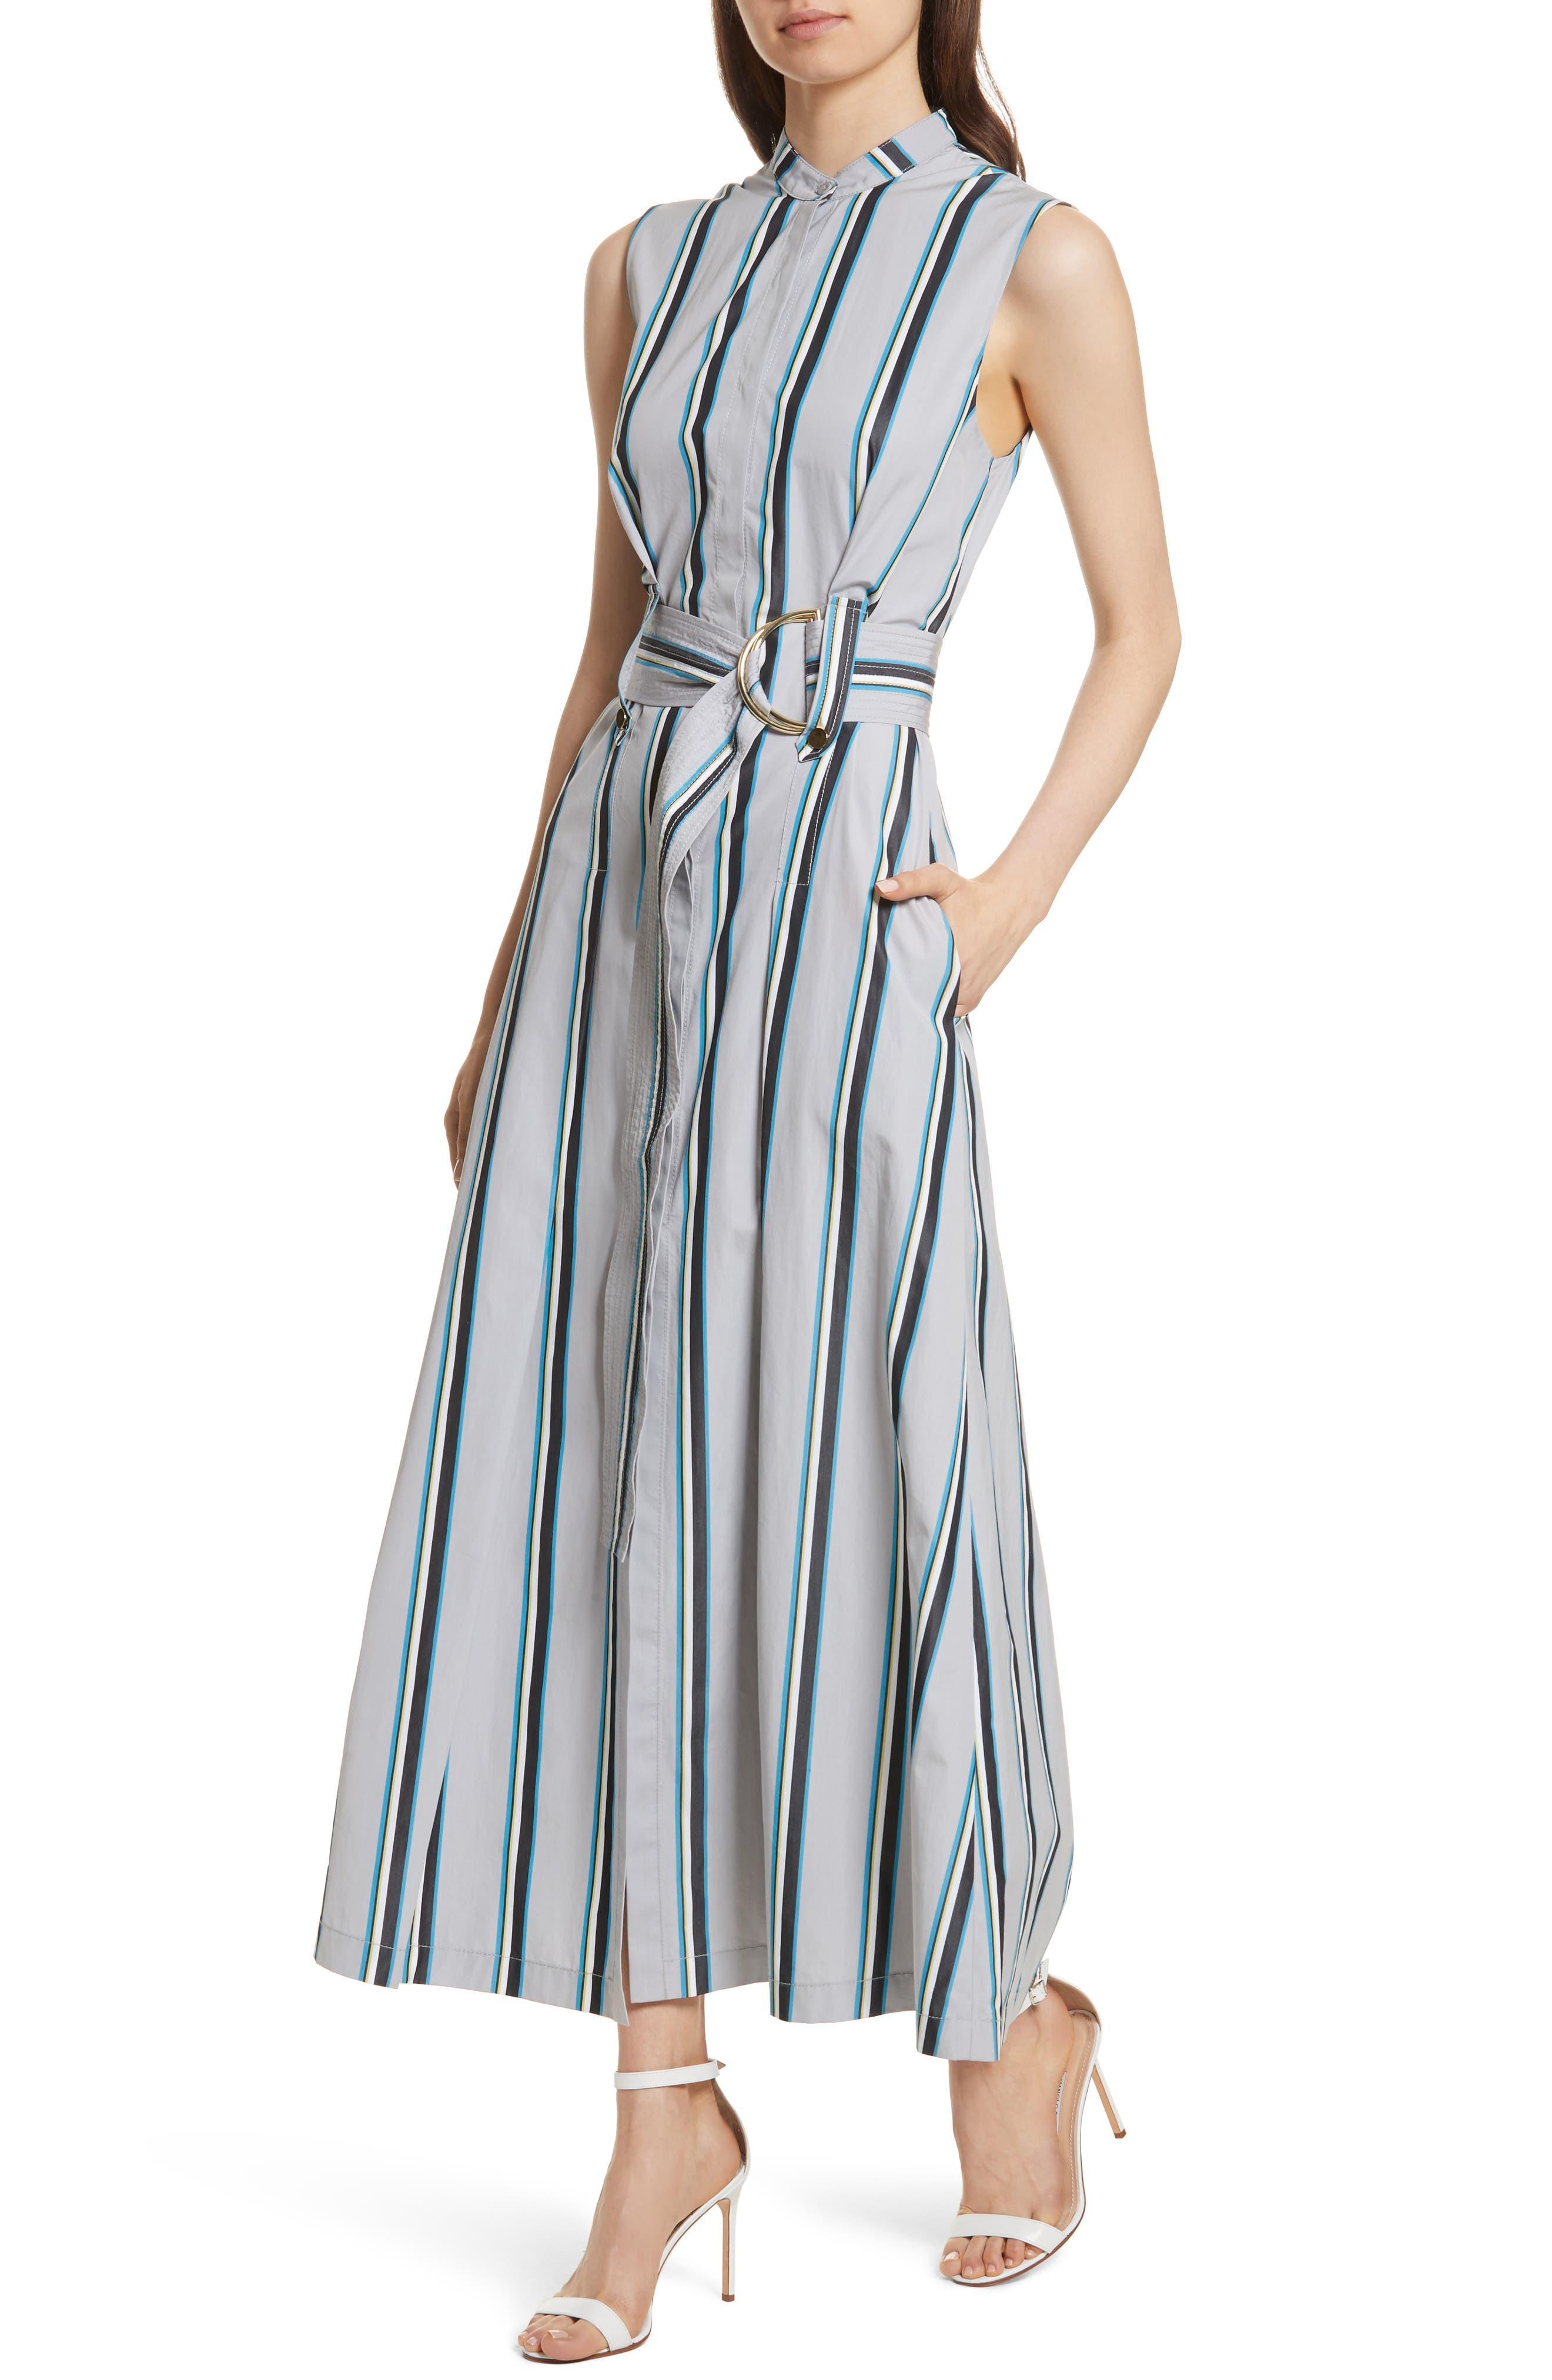 Diane von Furstenberg Stripe Belted Maxi Dress,                             Alternate thumbnail 4, color,                             Smoke Multi